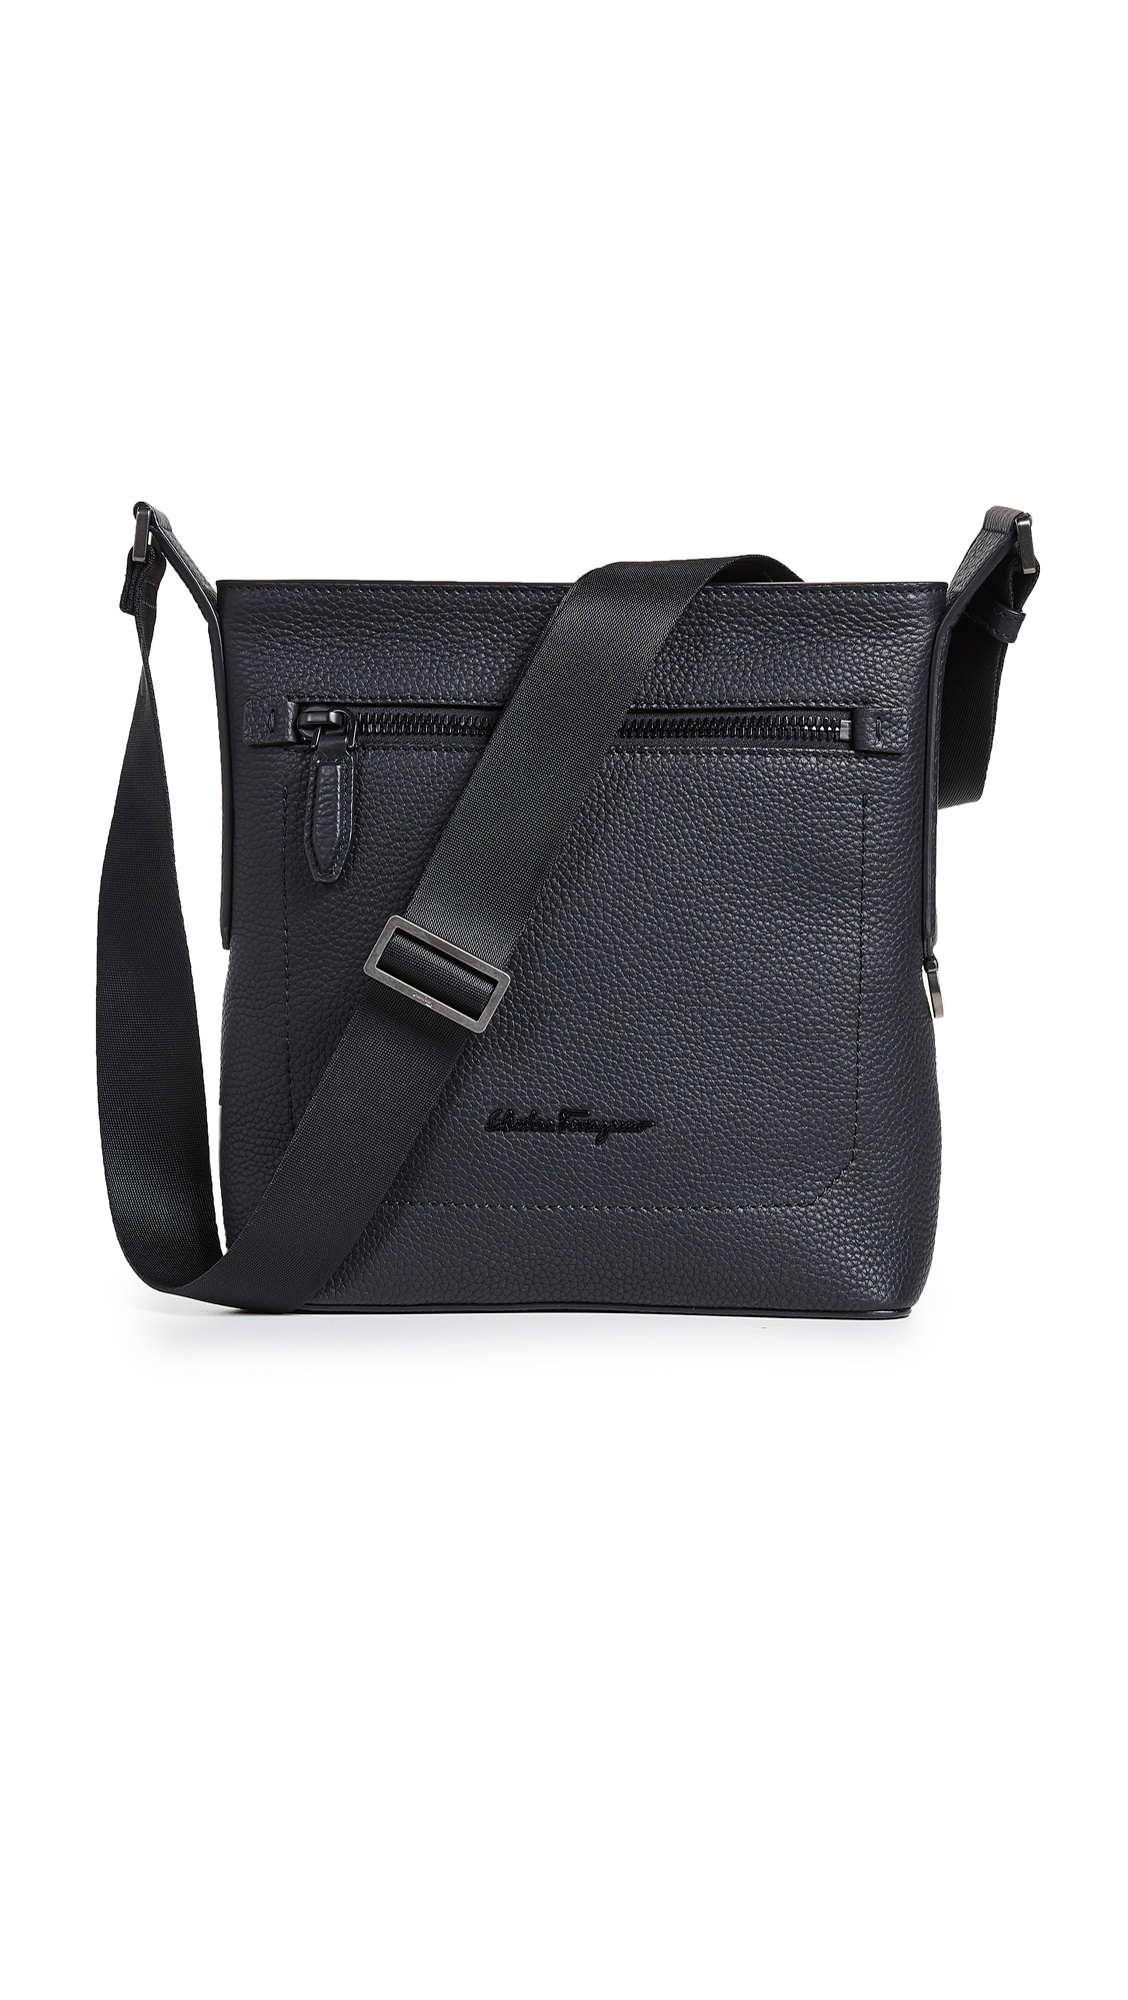 13fab63568 Salvatore Ferragamo Firenze Leather Crossbody Bag In Nero